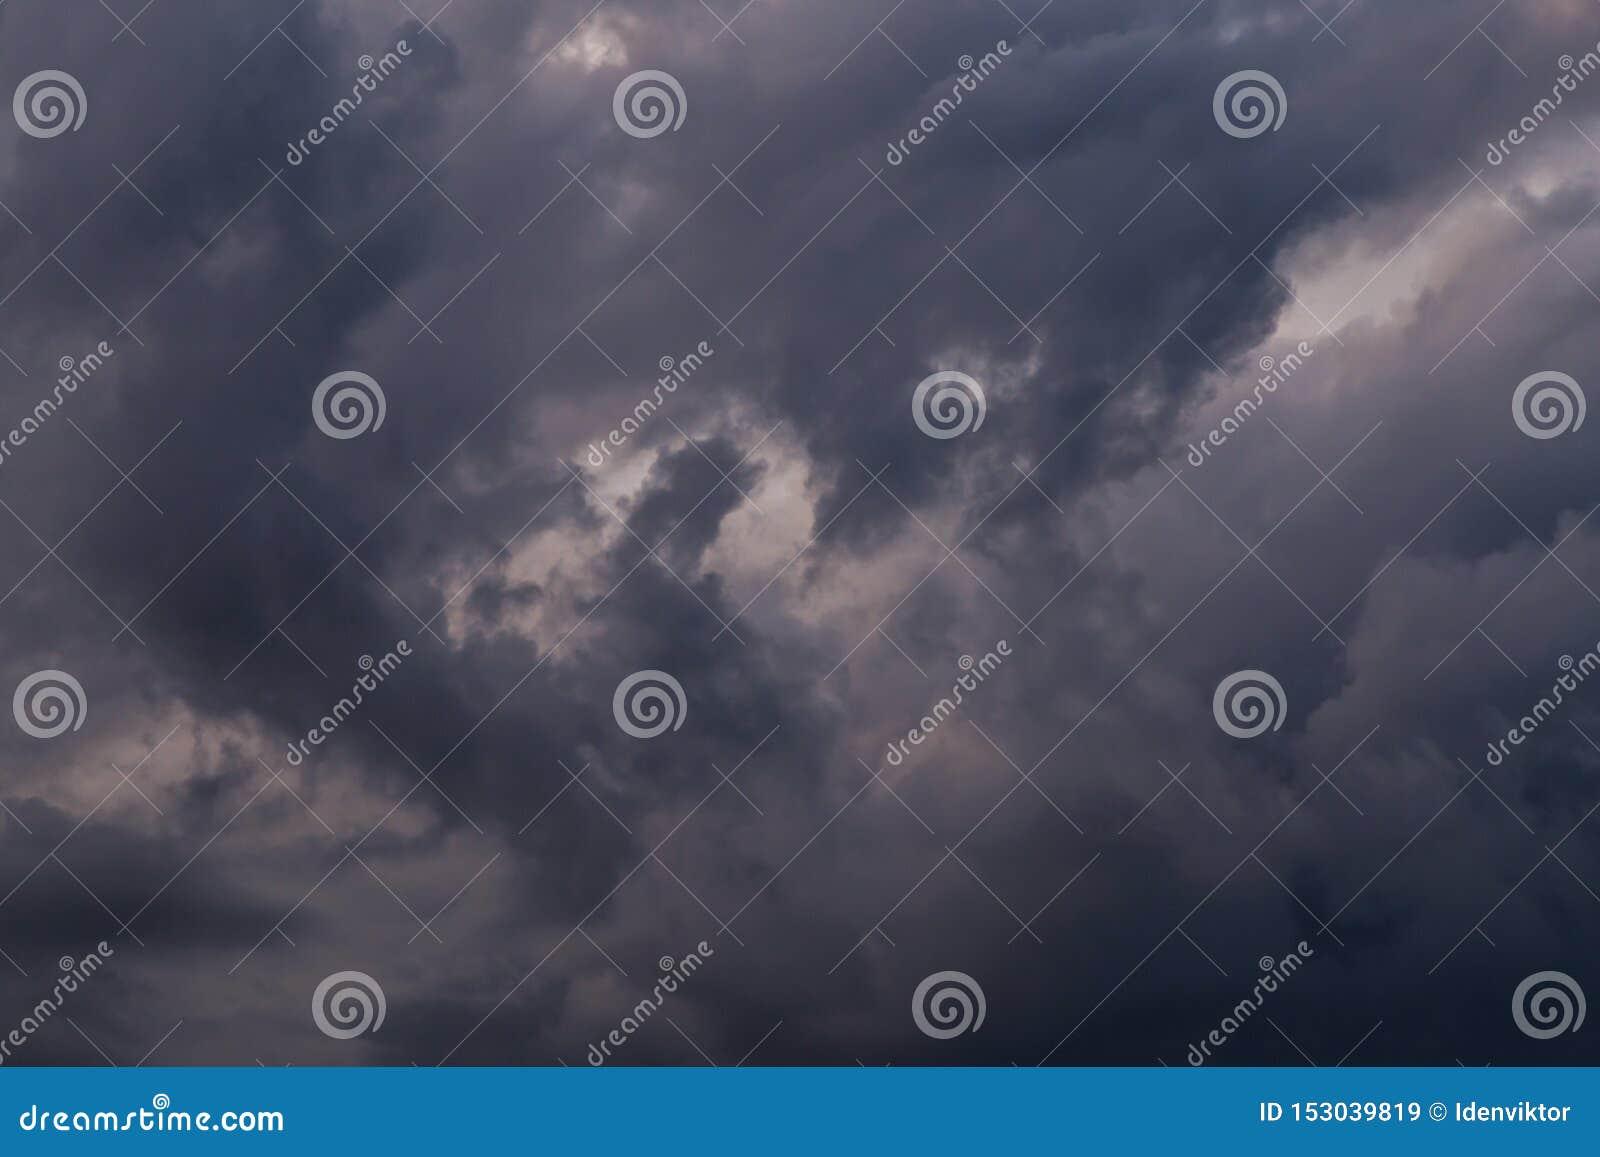 Burz chmur tekstury zbliżenie, ciemna nieba tła tekstura